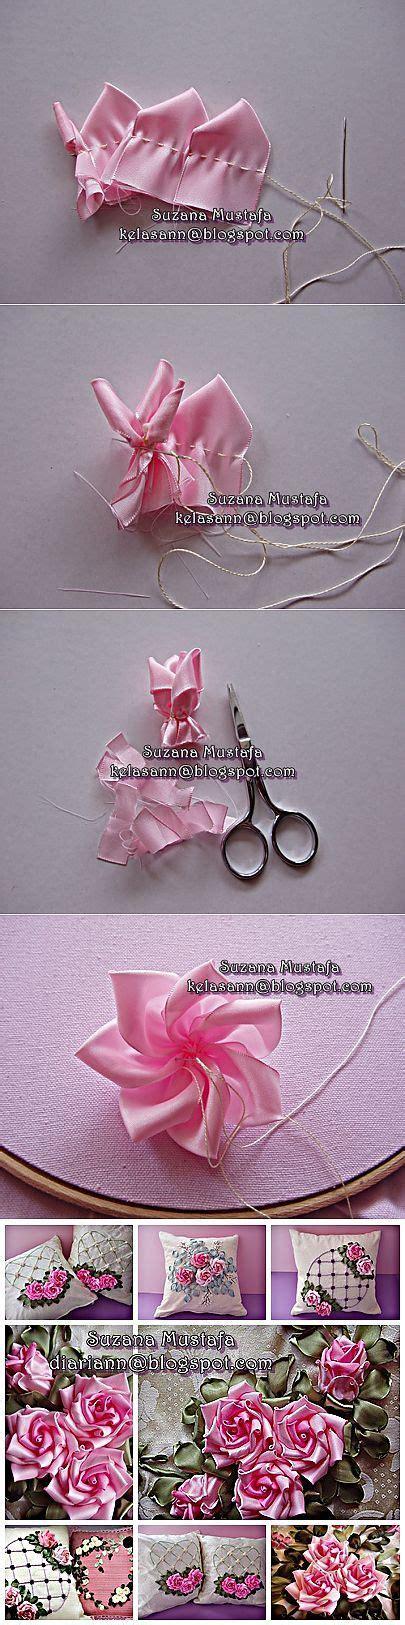 satin ribbon craft ideas best 25 ribbon ideas on ribbon flower 5364